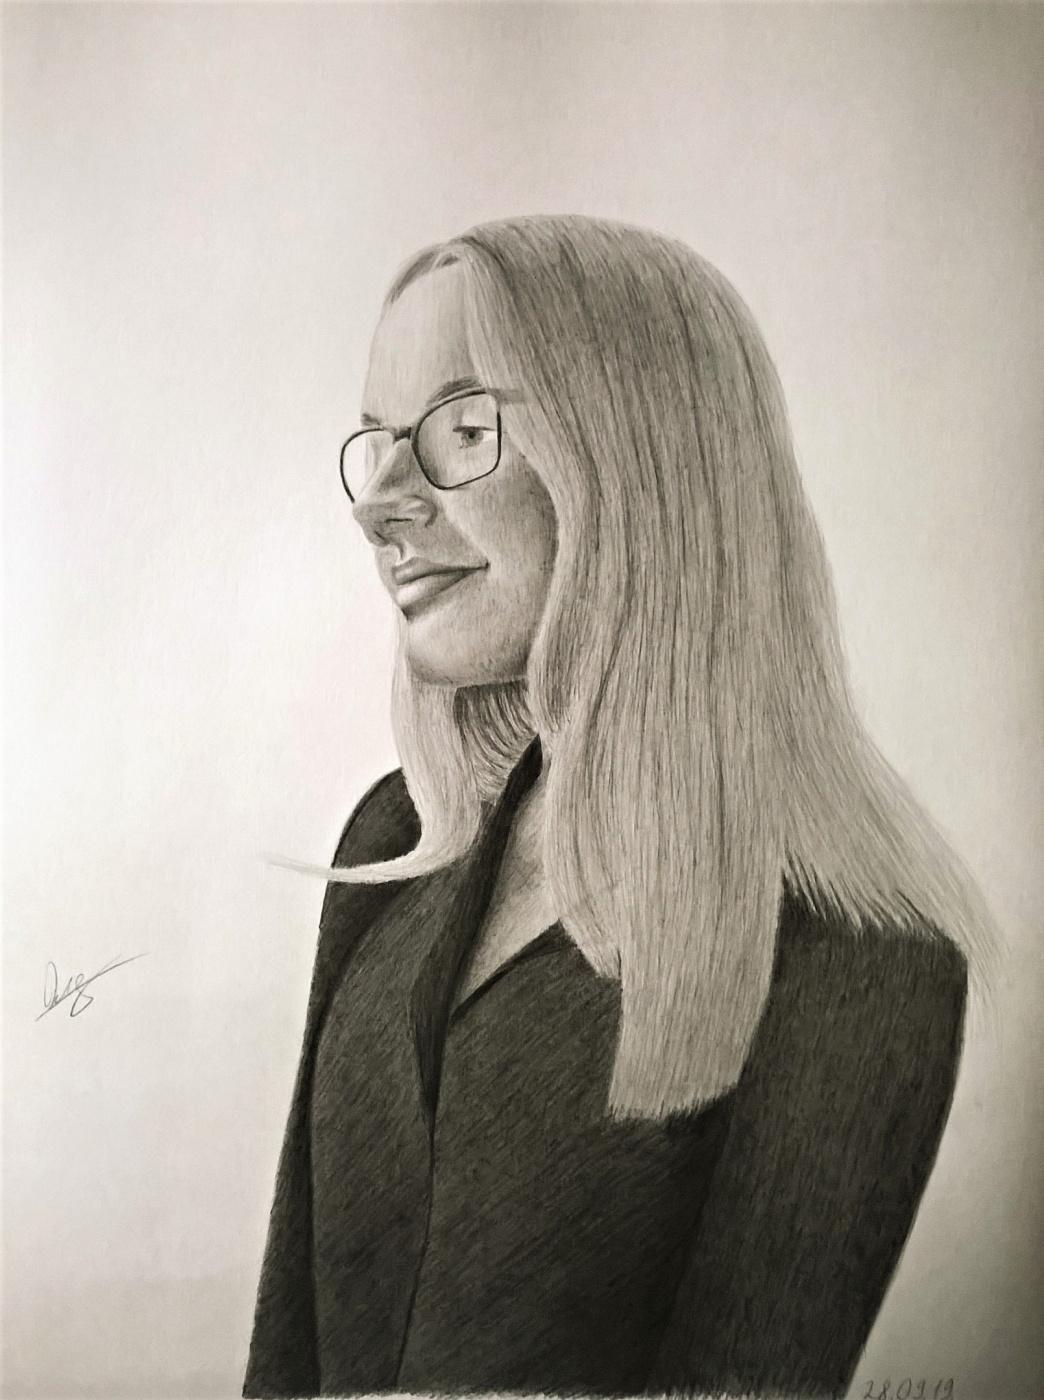 Victoria Aleksandrovna Oleinikova. Victoria Sergeevna